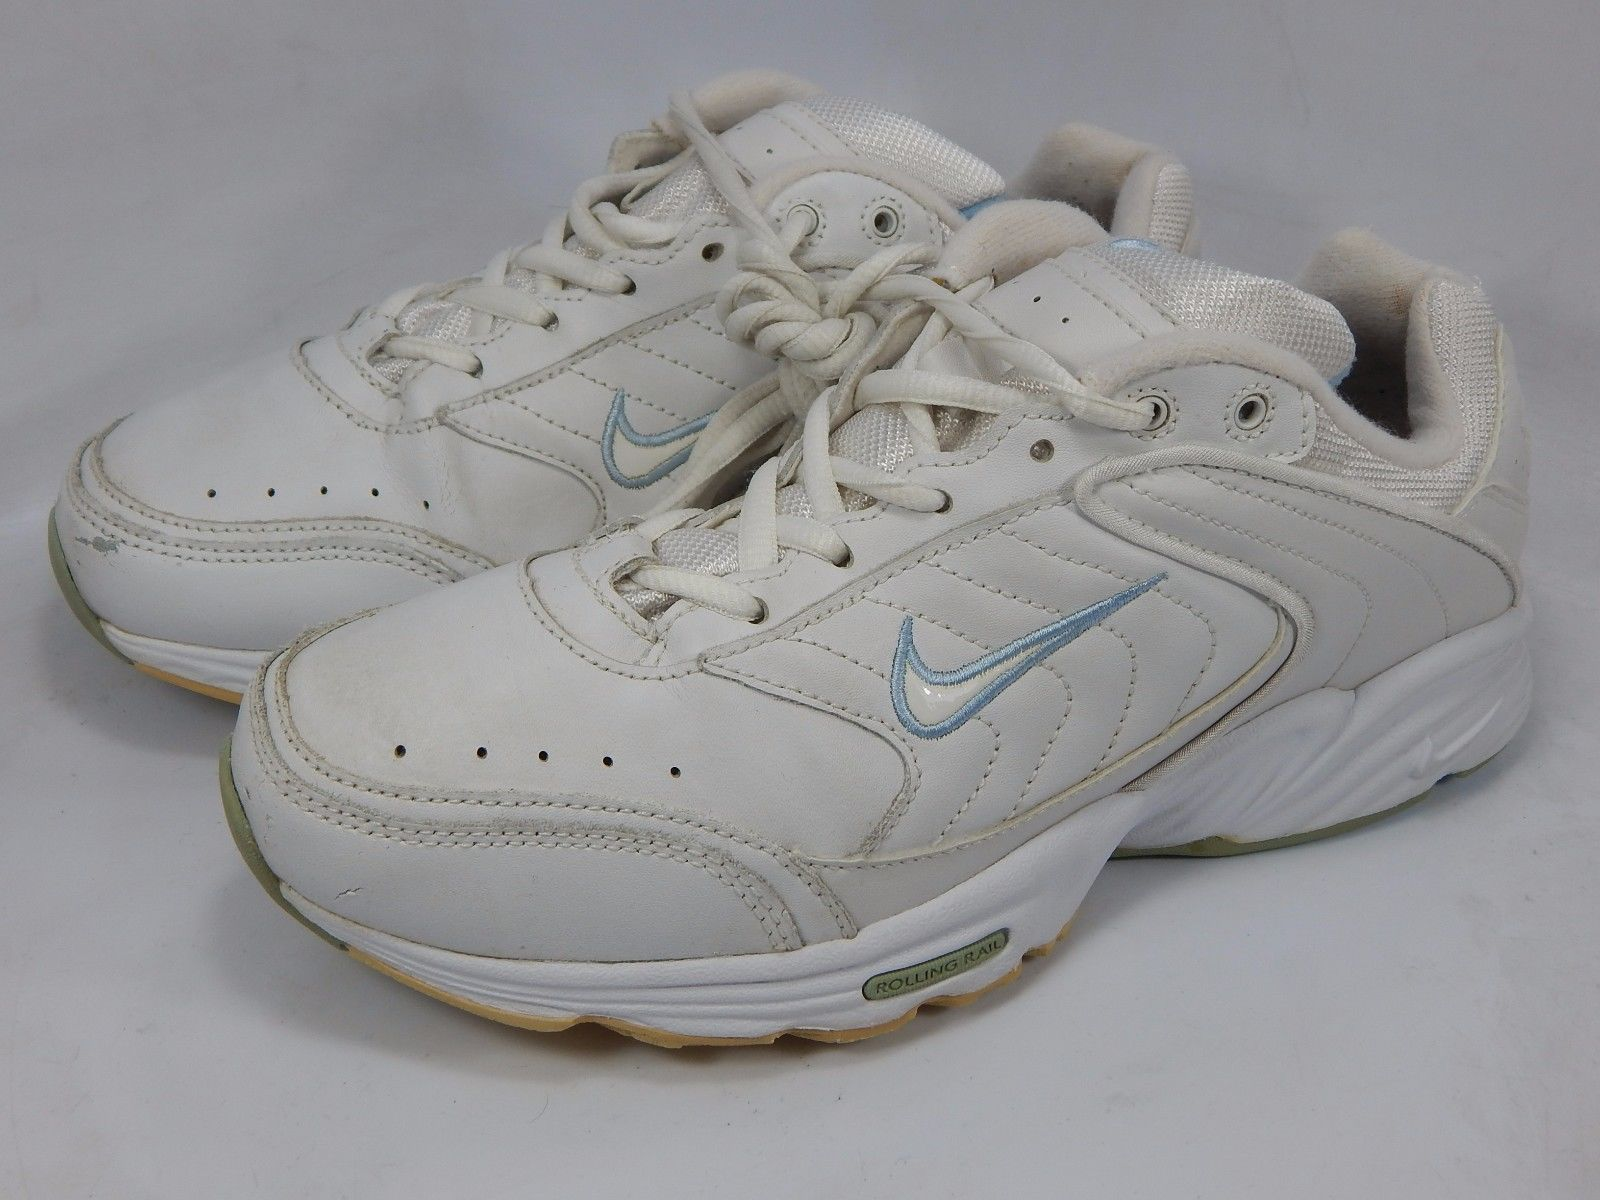 Nike 2004 Women's Walking Shoes Size US 9 M (B) EU 40.5 White 308699-112